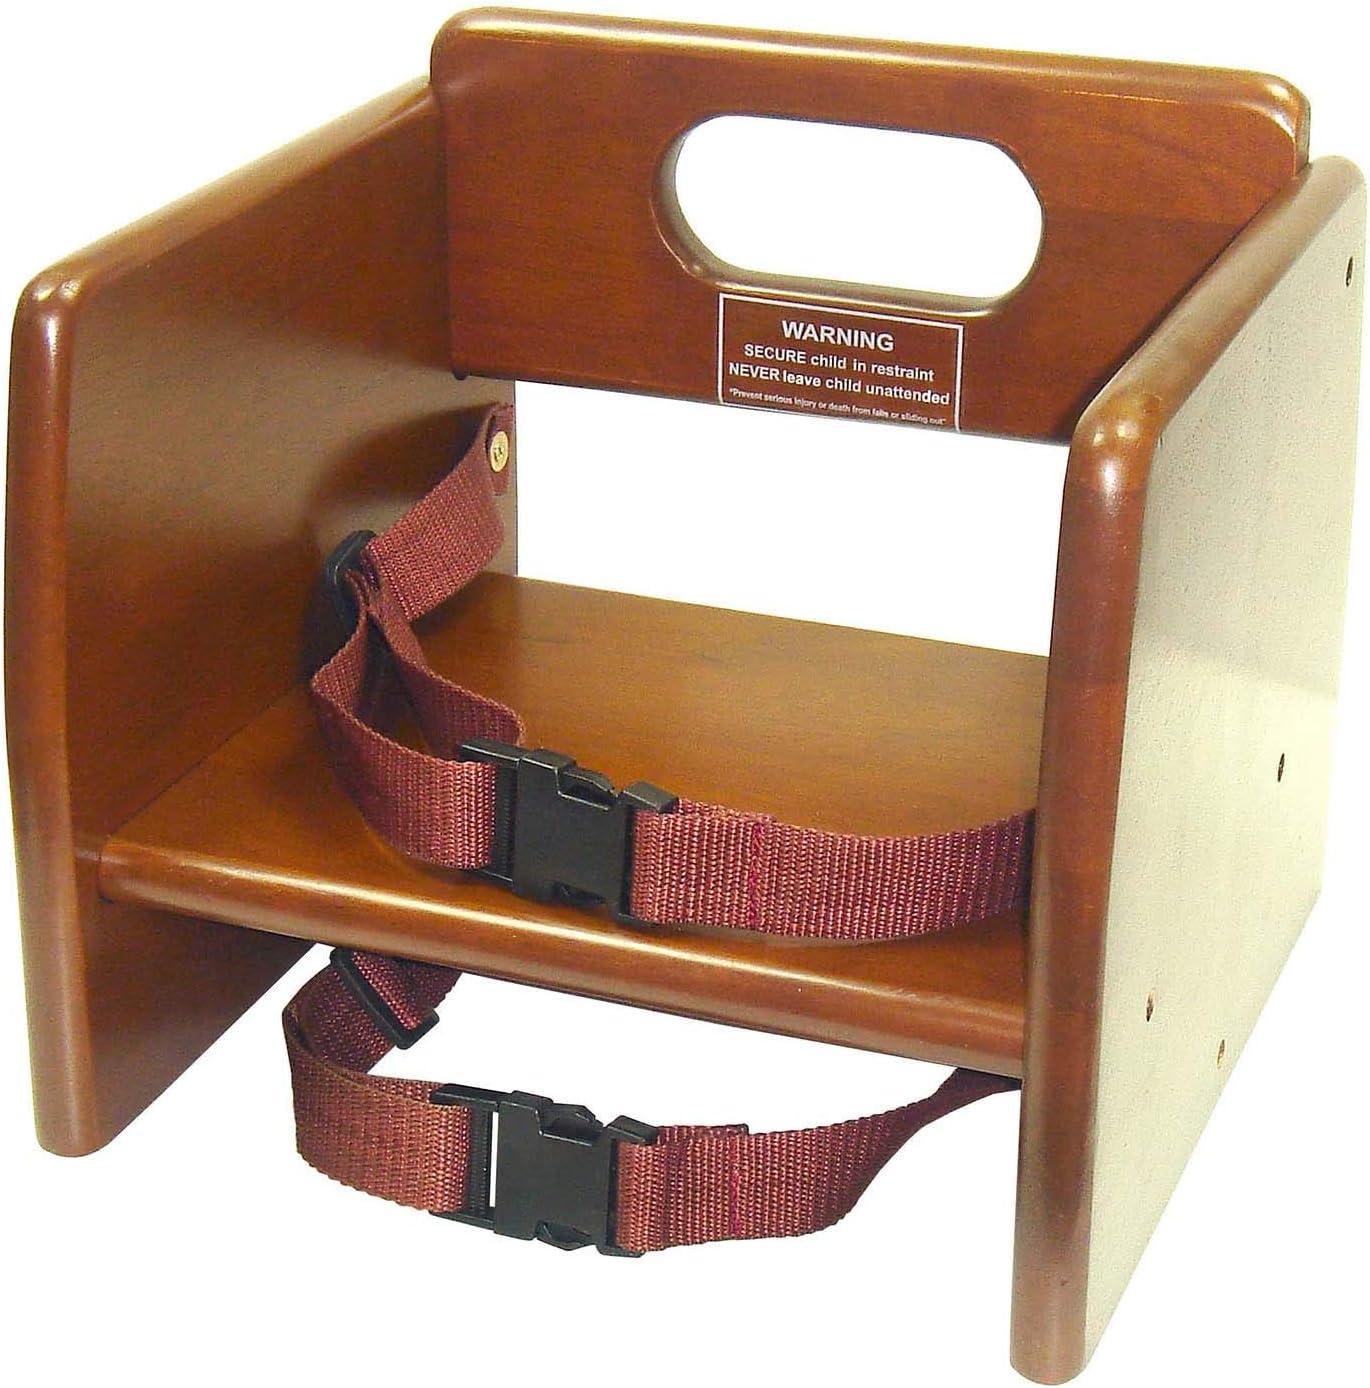 Winco CHB-704 Wooden Booster Seat Medium Brown Walnut